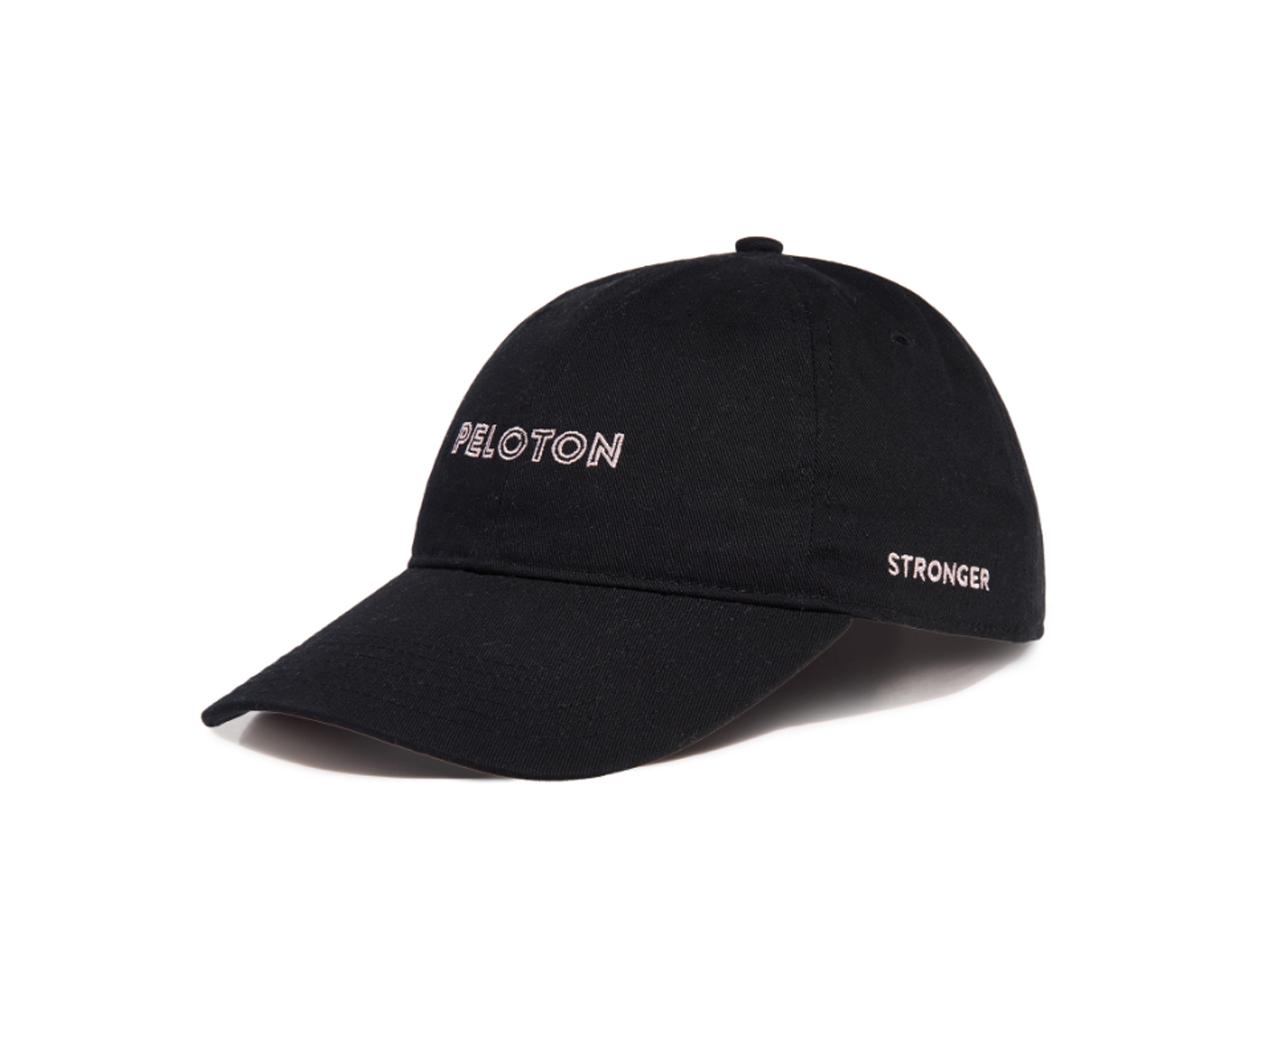 Peloton_BCRFShopPink2021_Hat#1.png